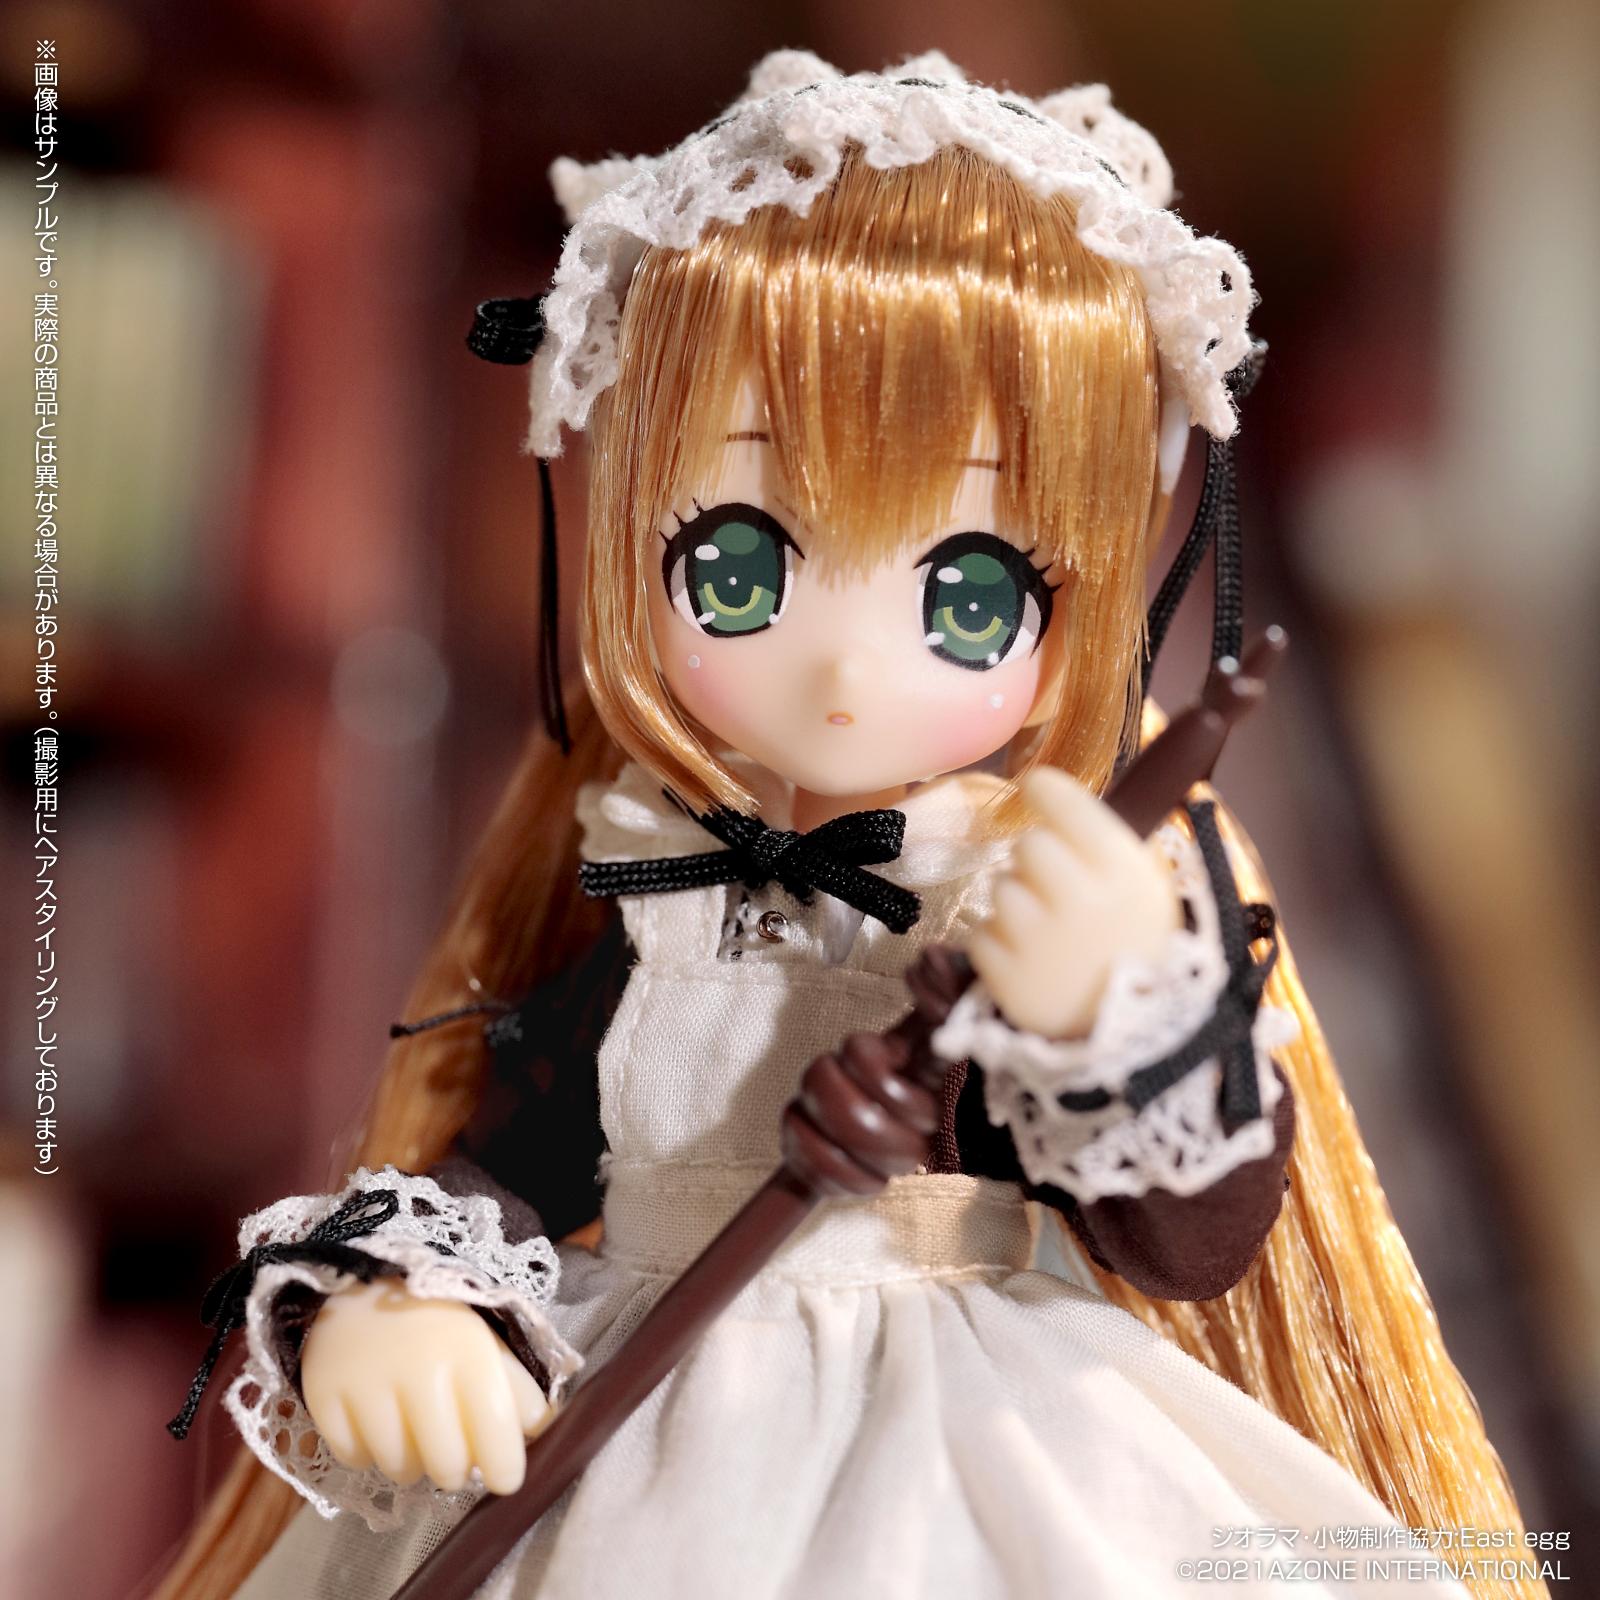 Lil'Fairy ~ちいさなお手伝いさん~『リプー 7th anniv.(ノーマル口ver.)』1/12 完成品ドール-003